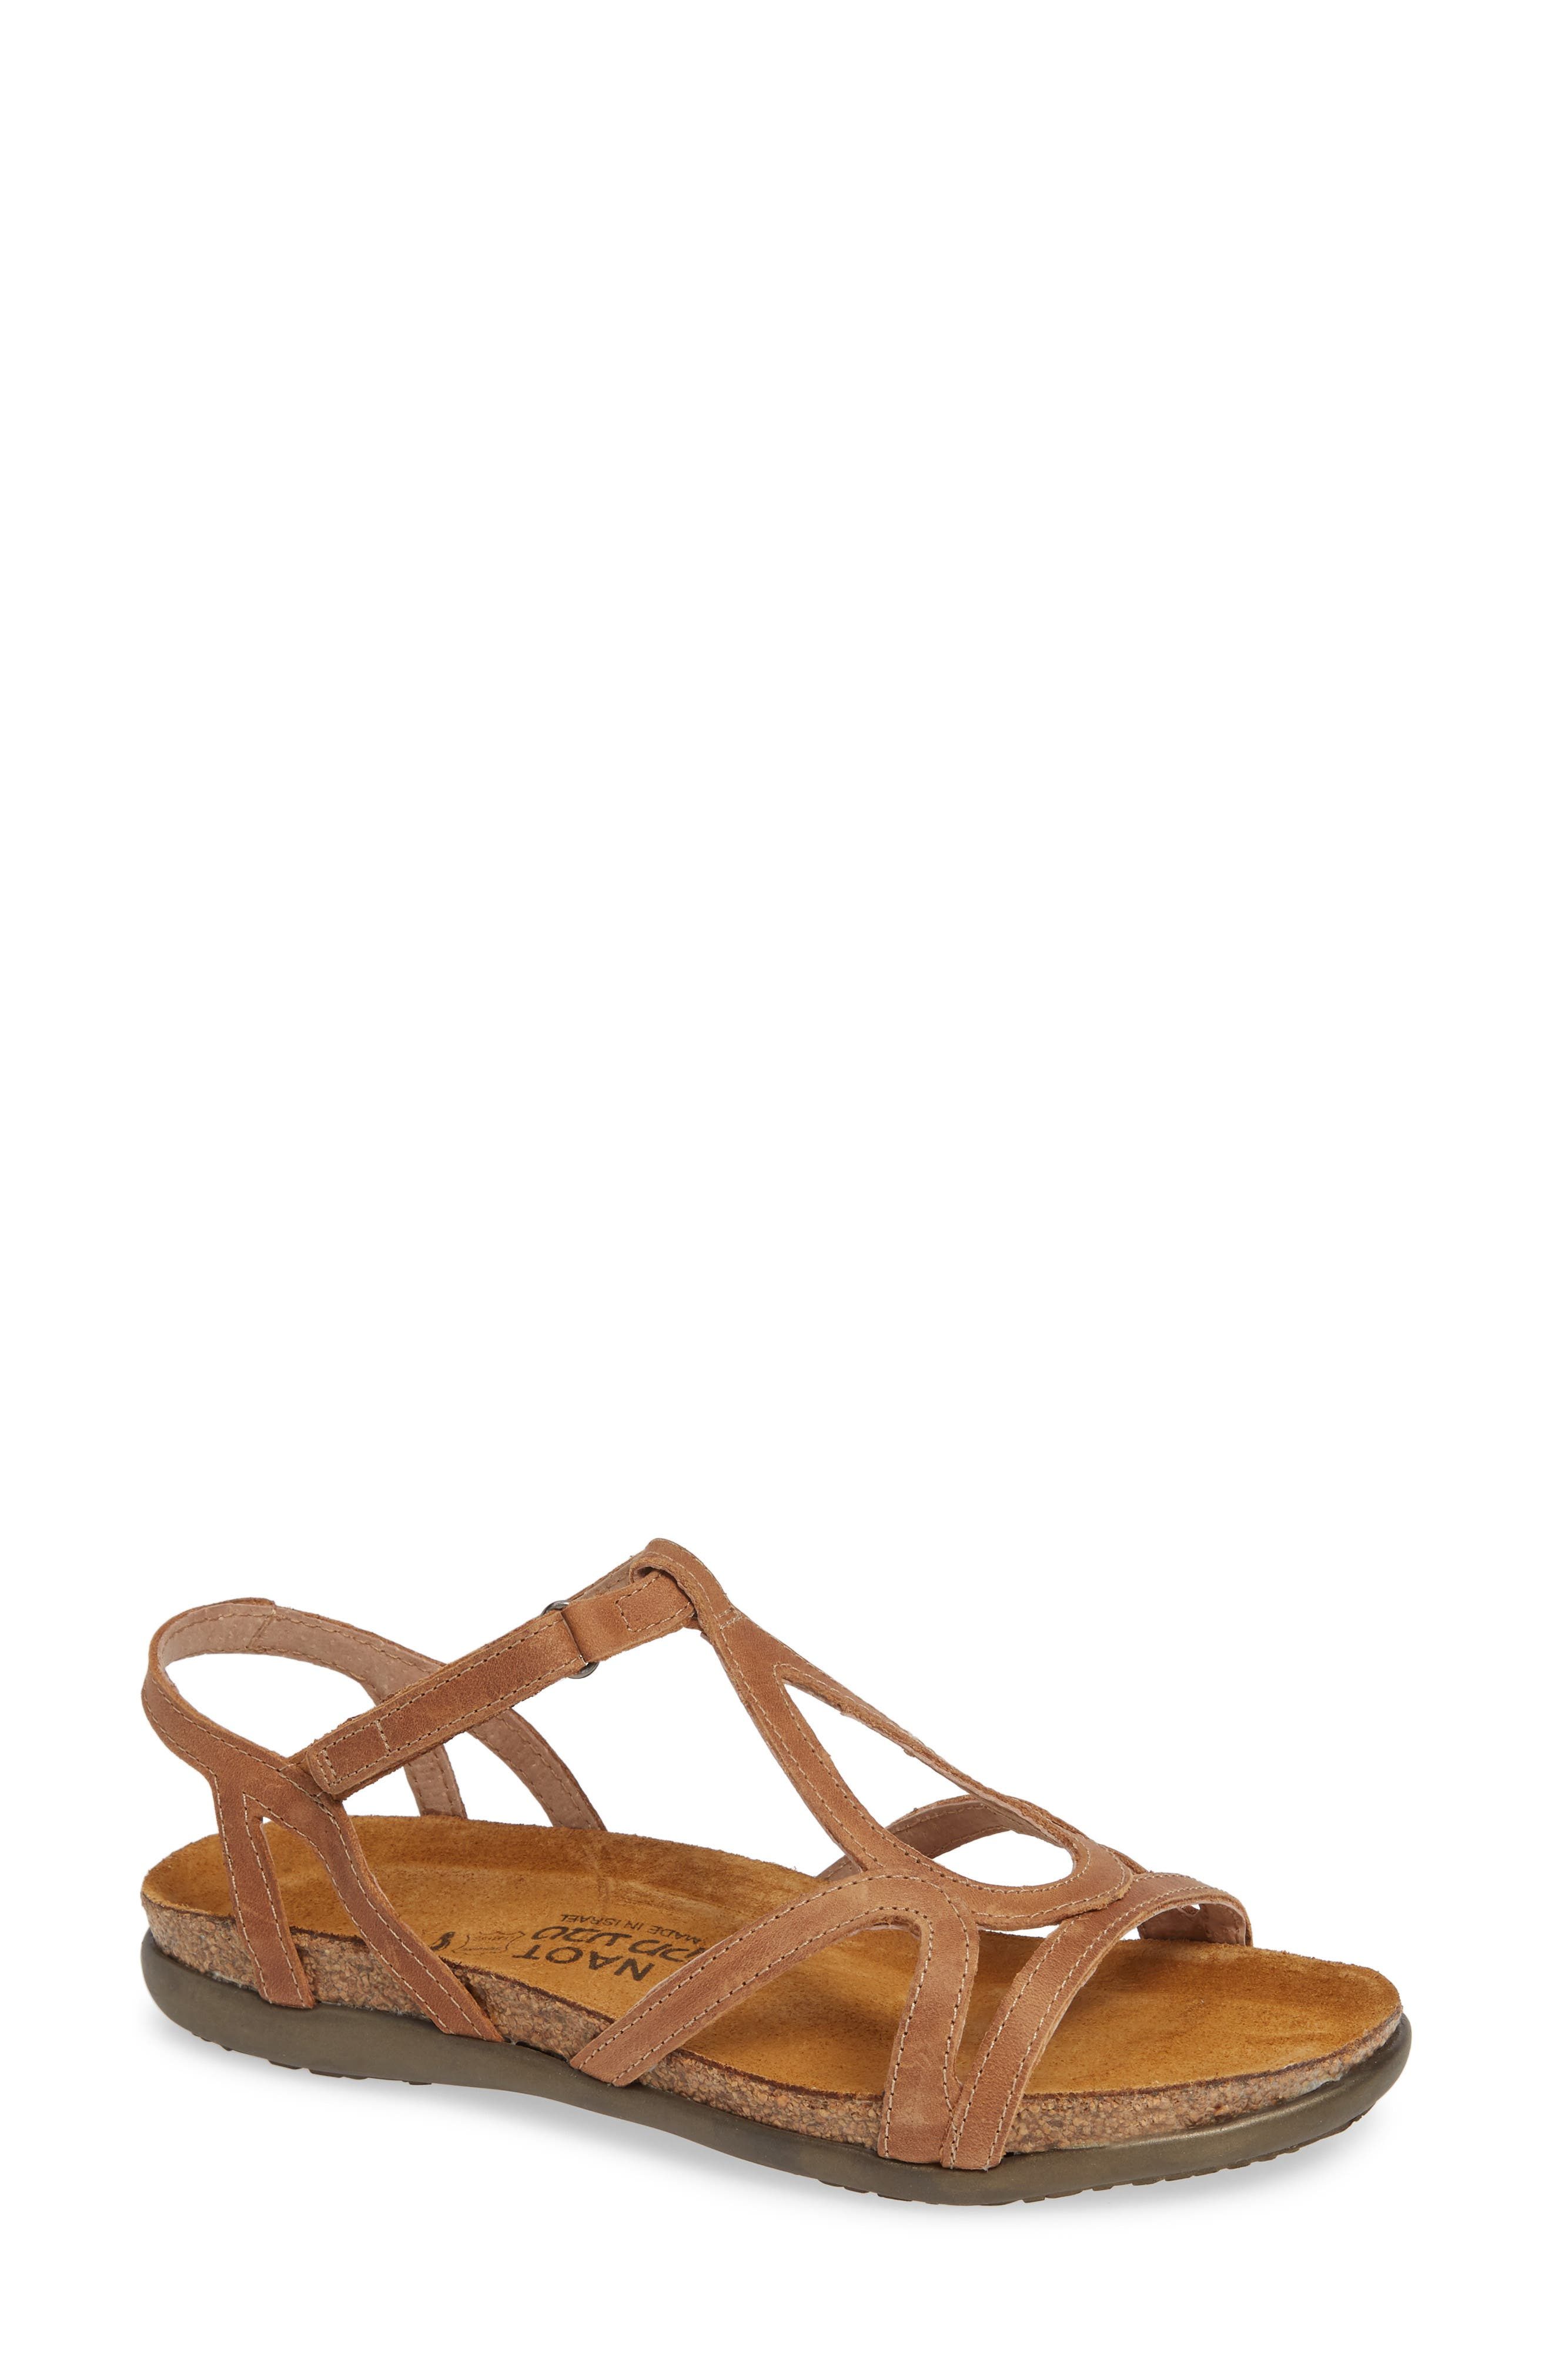 'Dorith' Sandal,                         Main,                         color, LATTE BROWN LEATHER